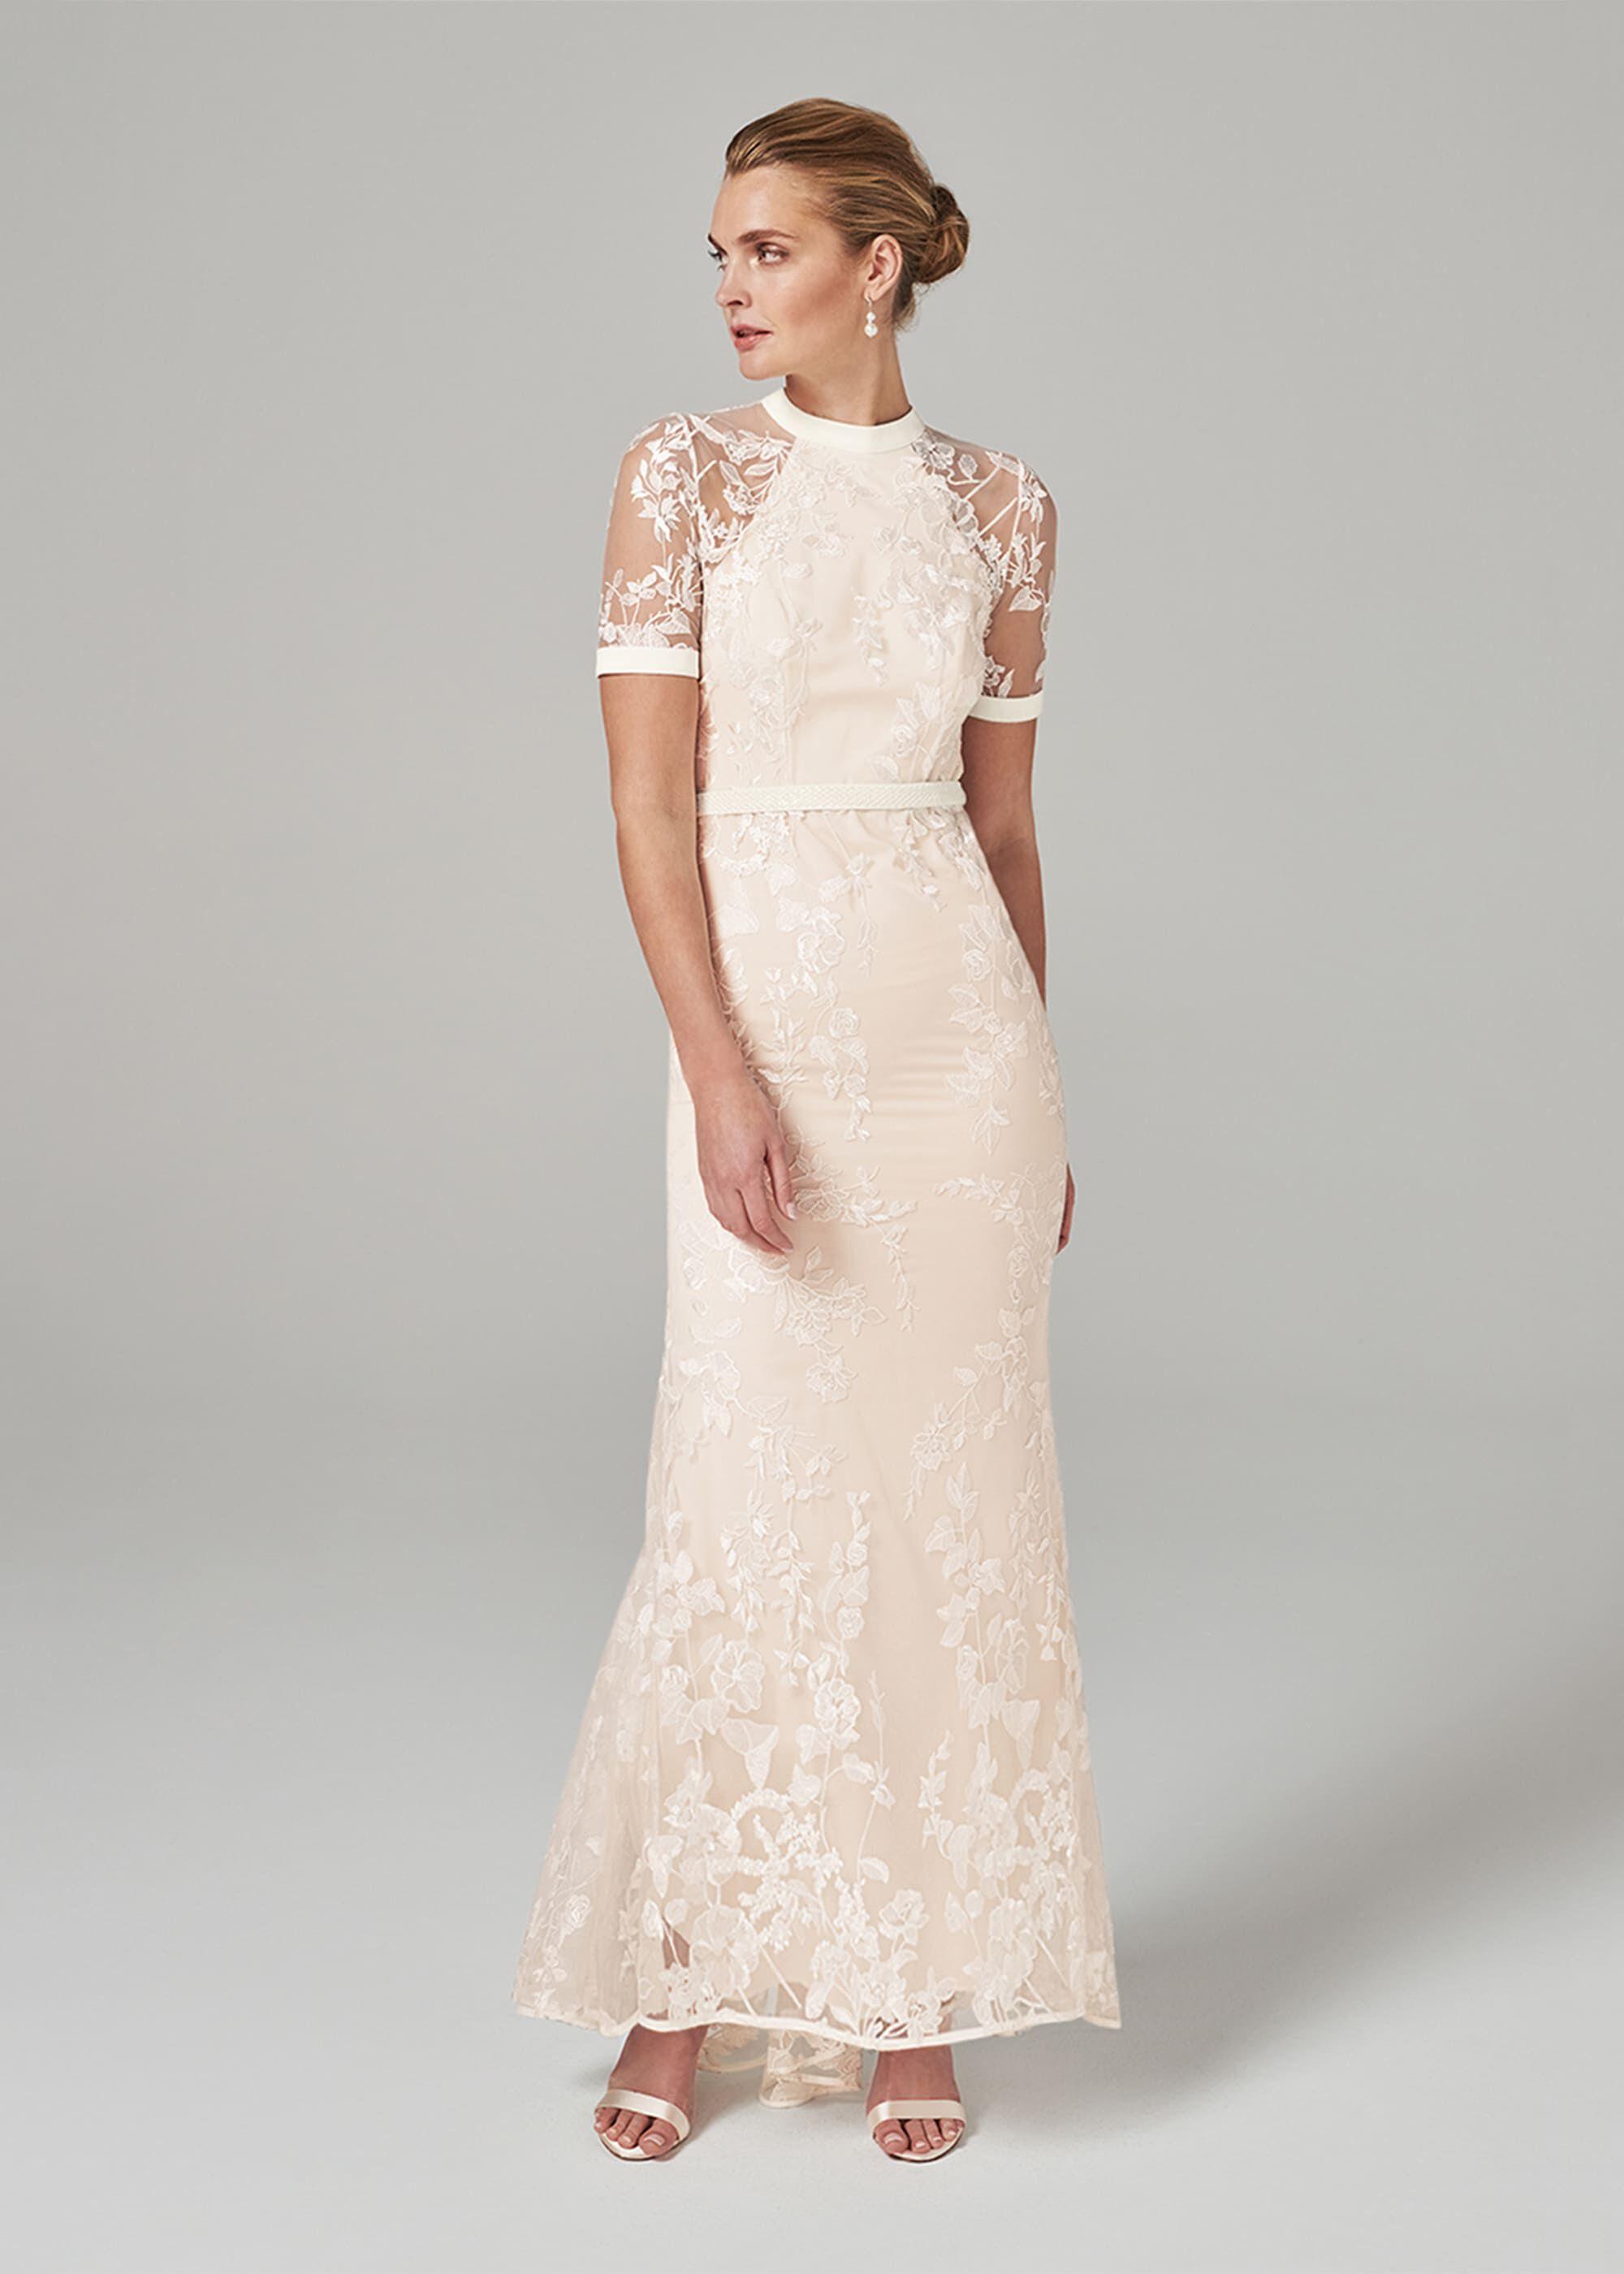 Poppy Embroidered Wedding Dress | Phase